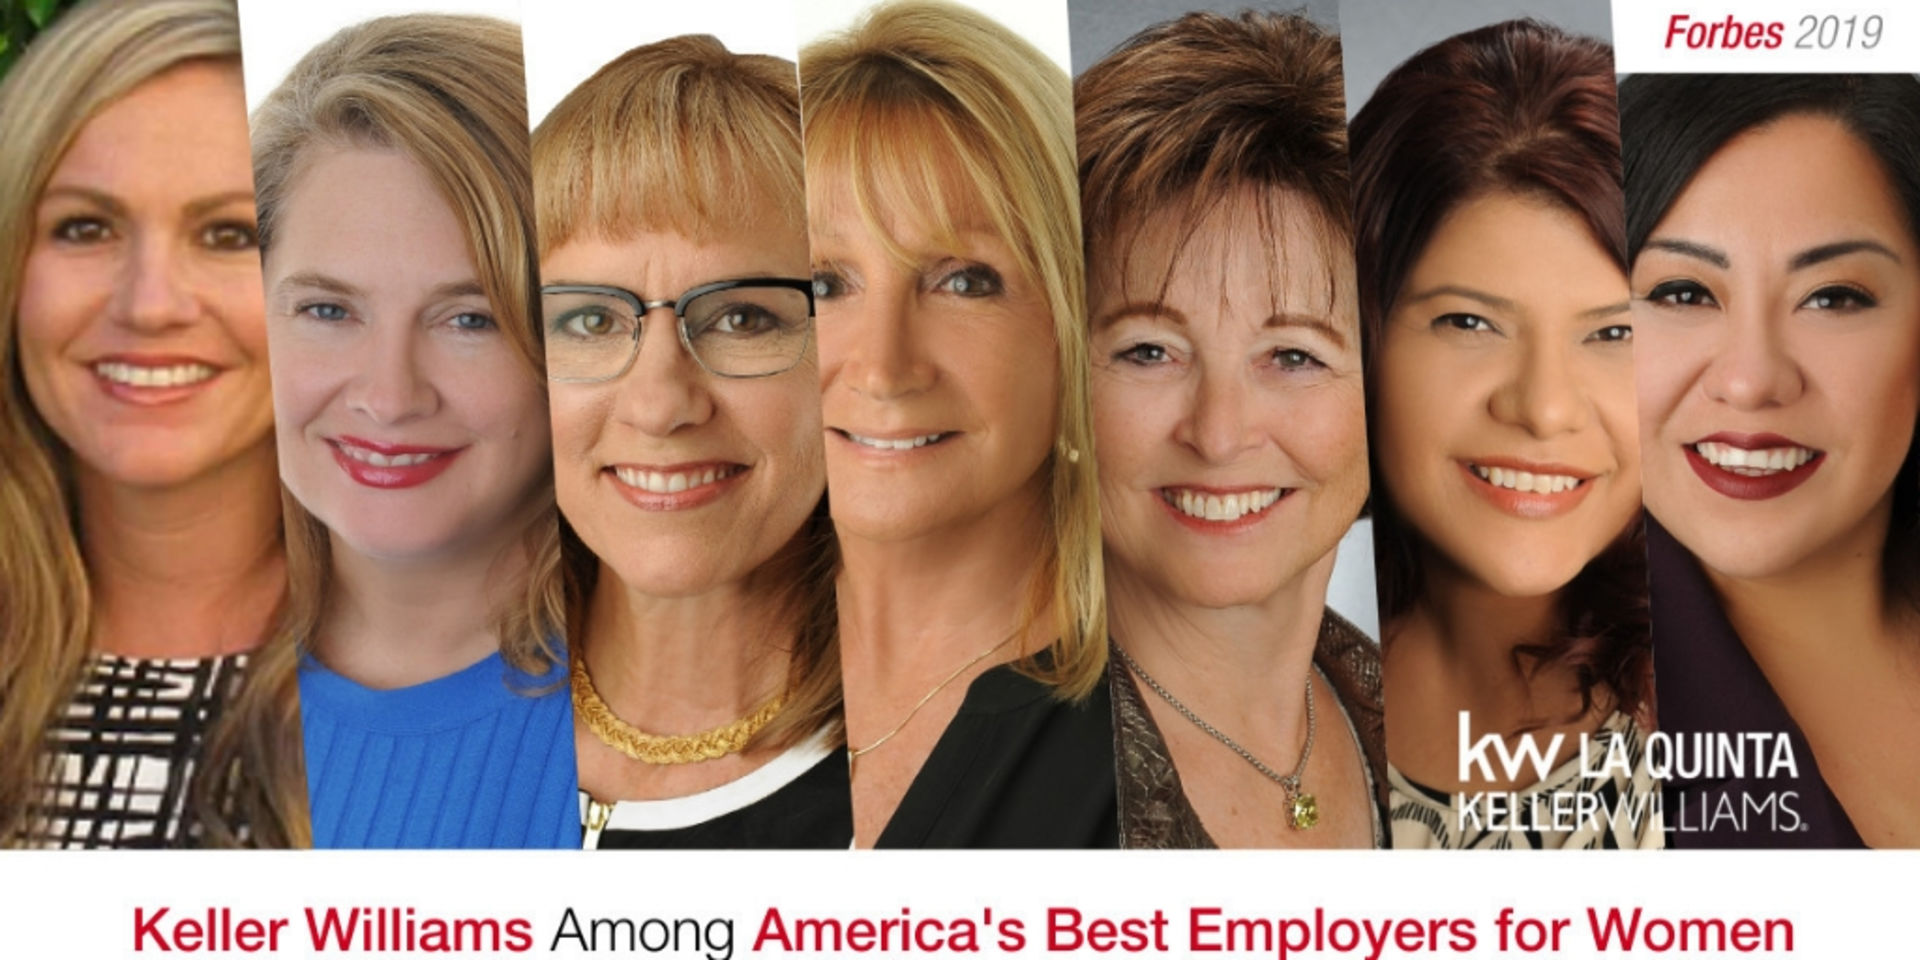 America's Best Employers for Women